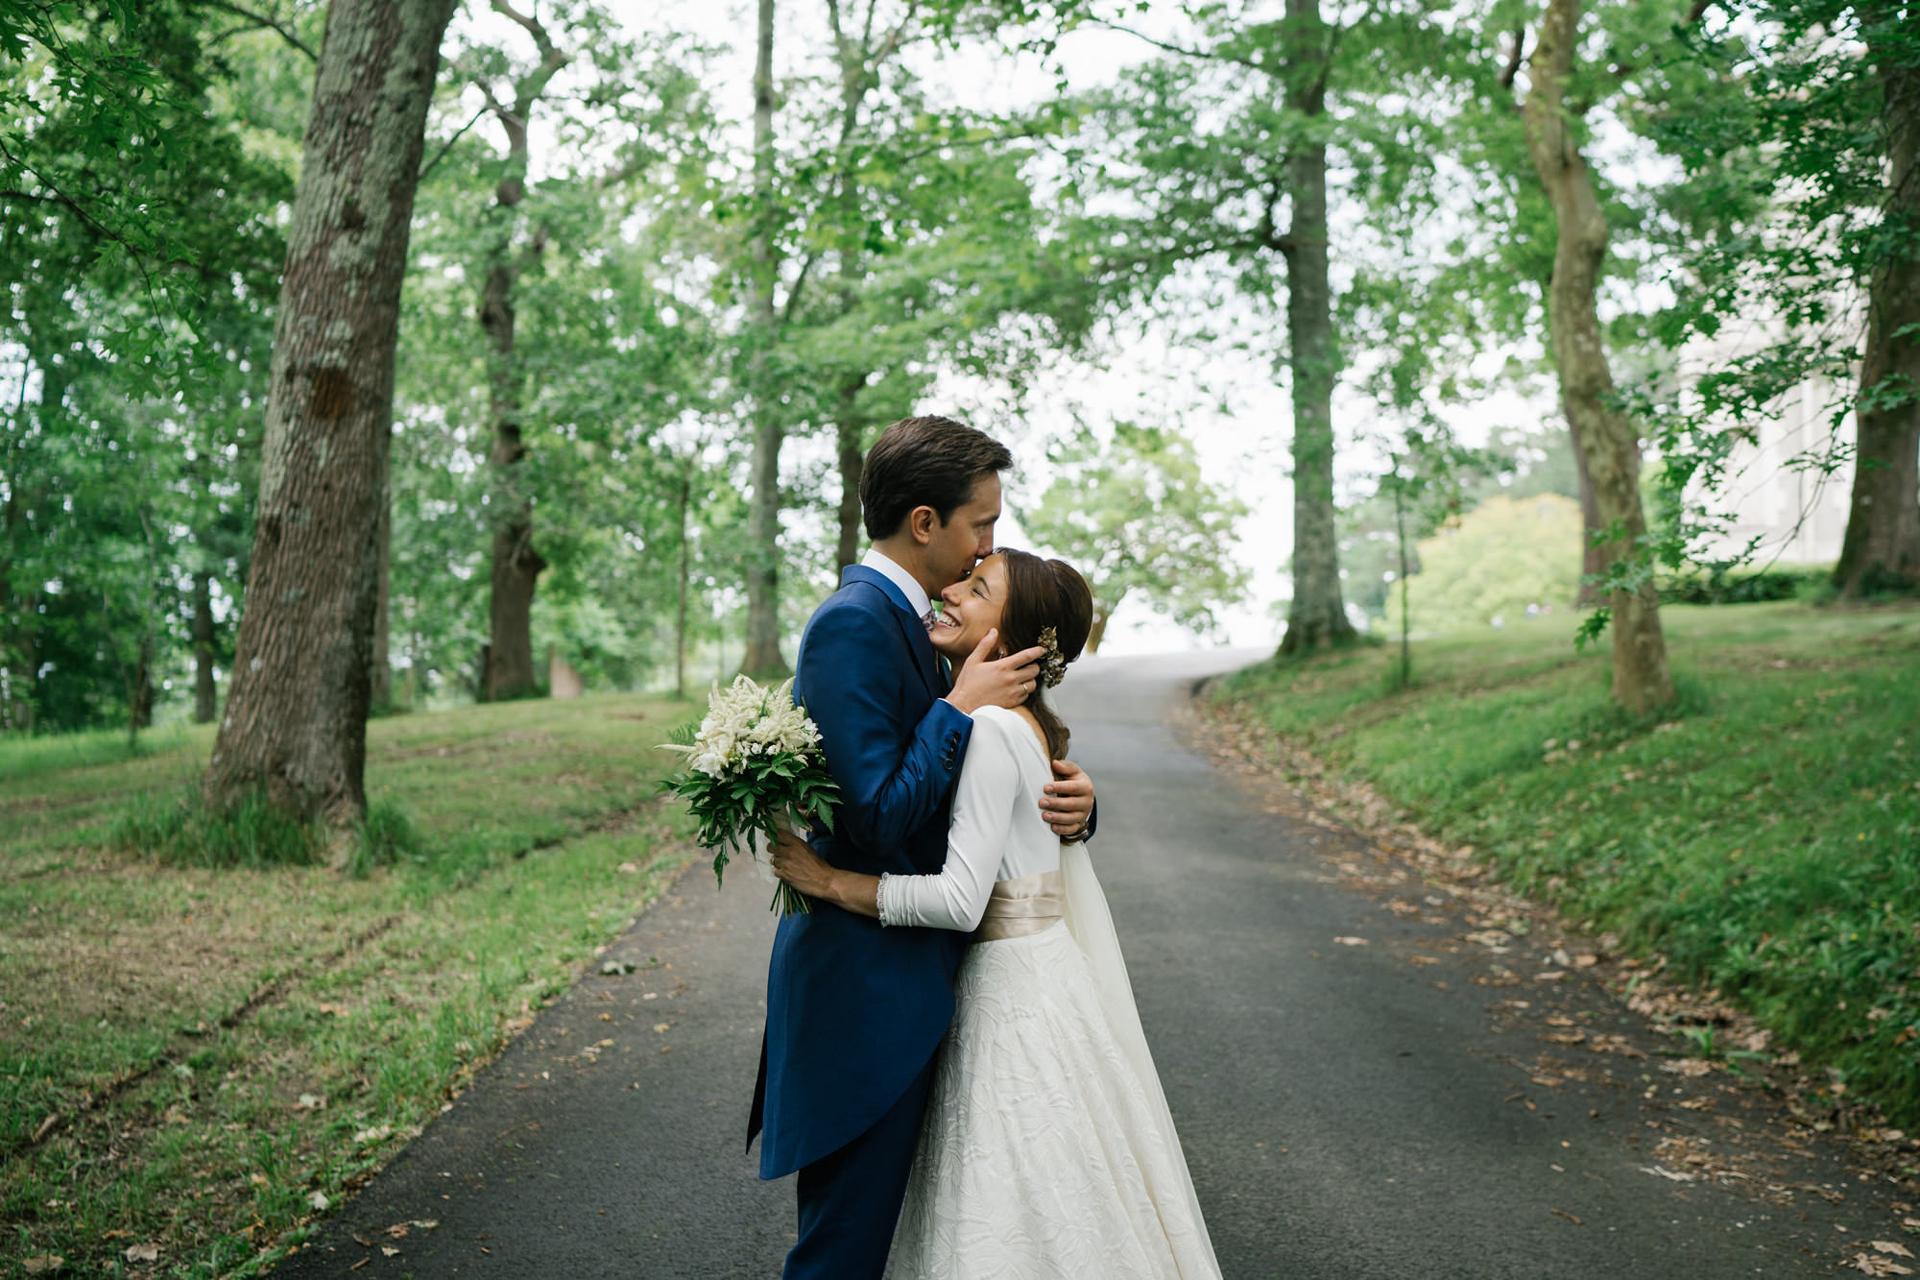 Wedding & Event Planner - Destination Wedding en San Sebastián - Boda Beatriz y Gonzalo 03